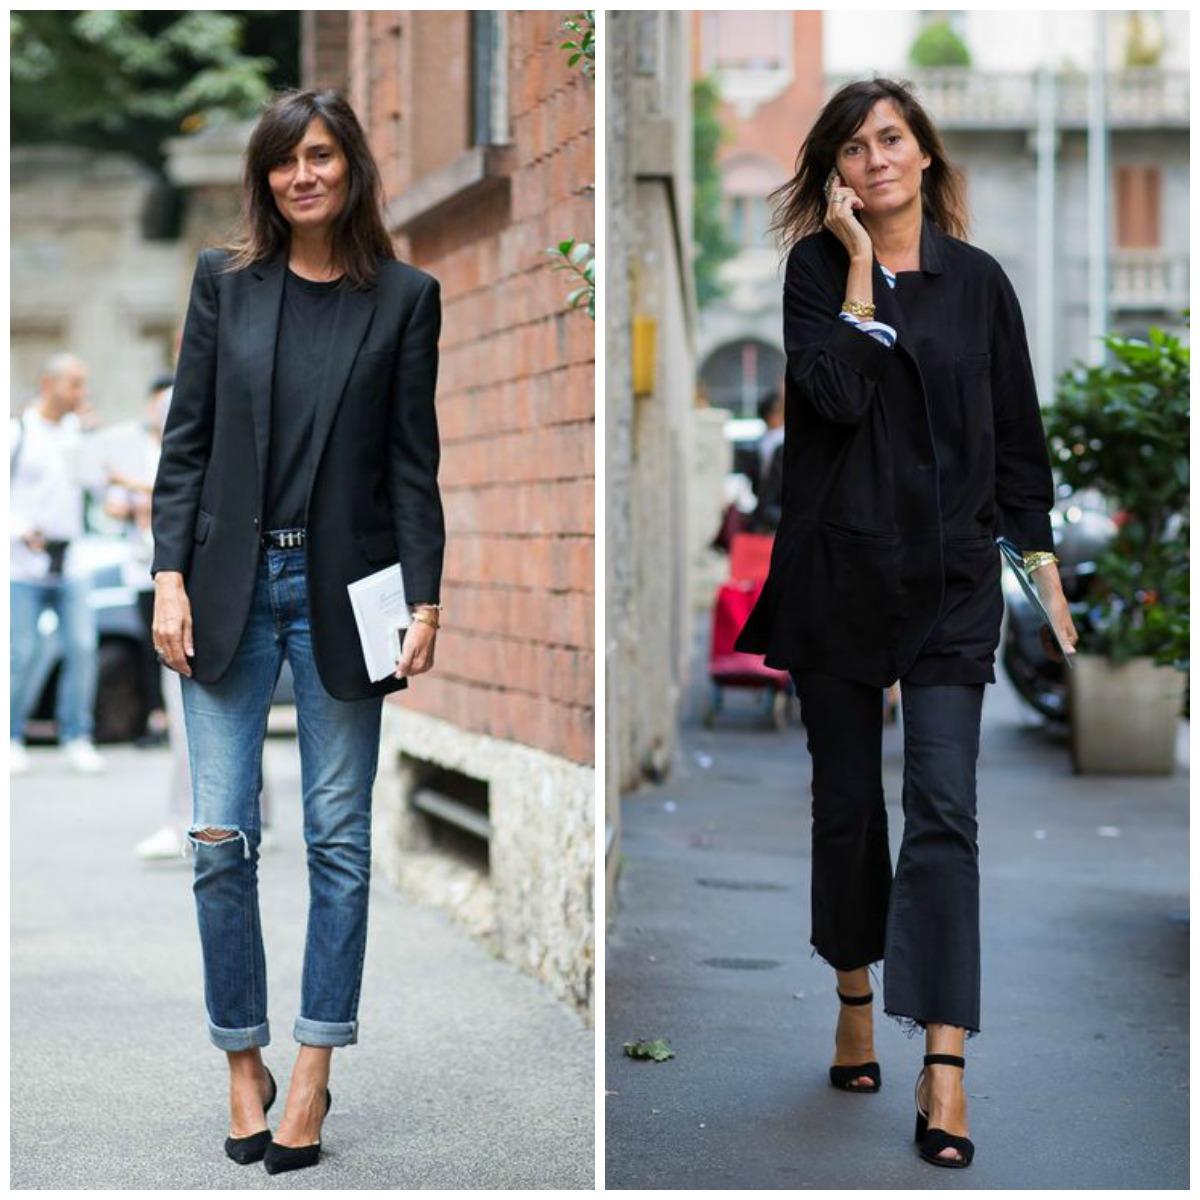 Elevated Basics: A Few Good Jackets